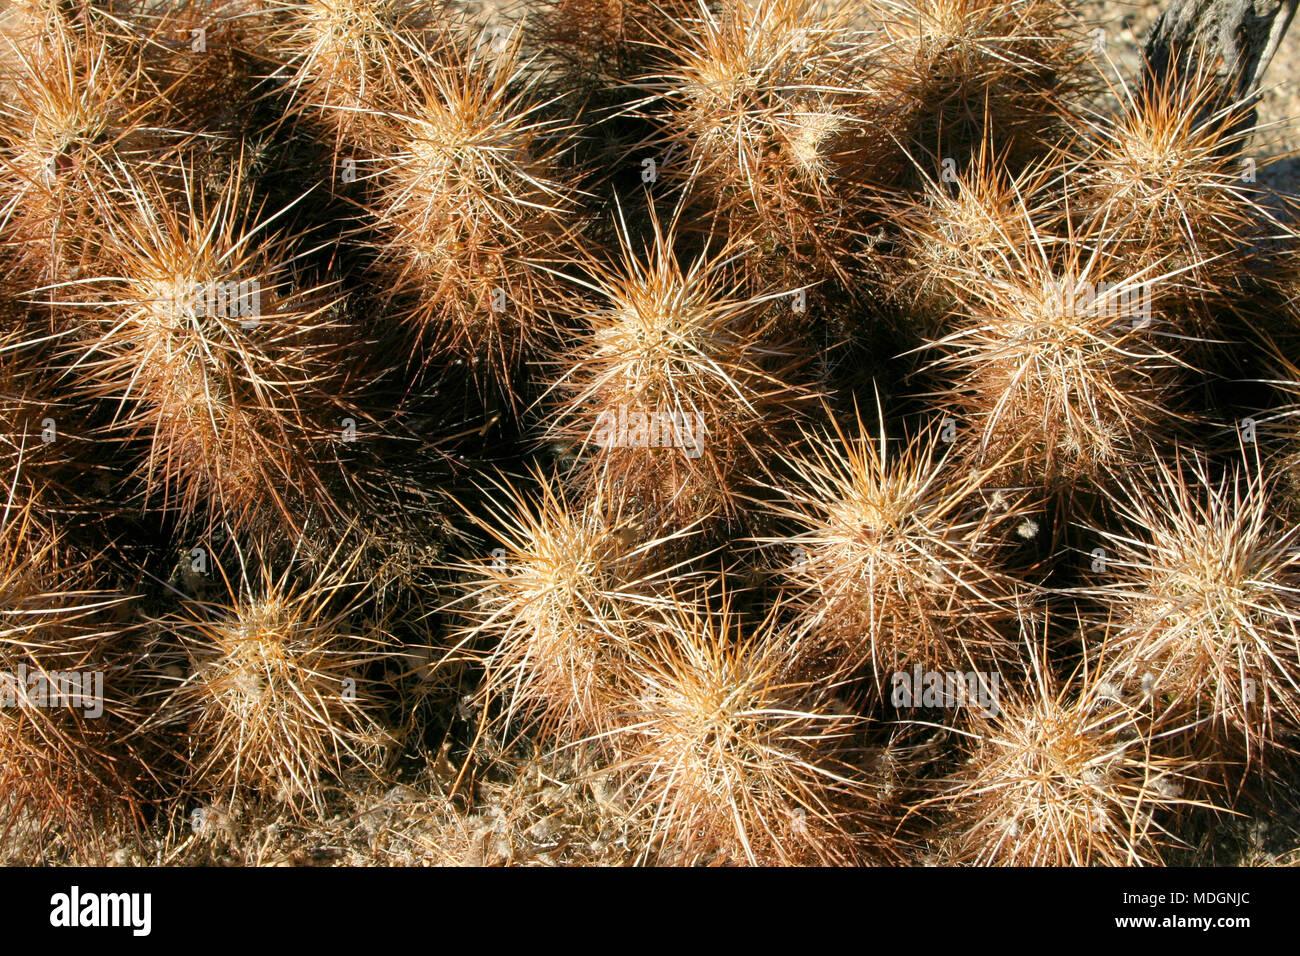 Echinocereus engelmani.  Group of cacti among stones, Mojave Desert, Joshua Tree National Park, California Stock Photo